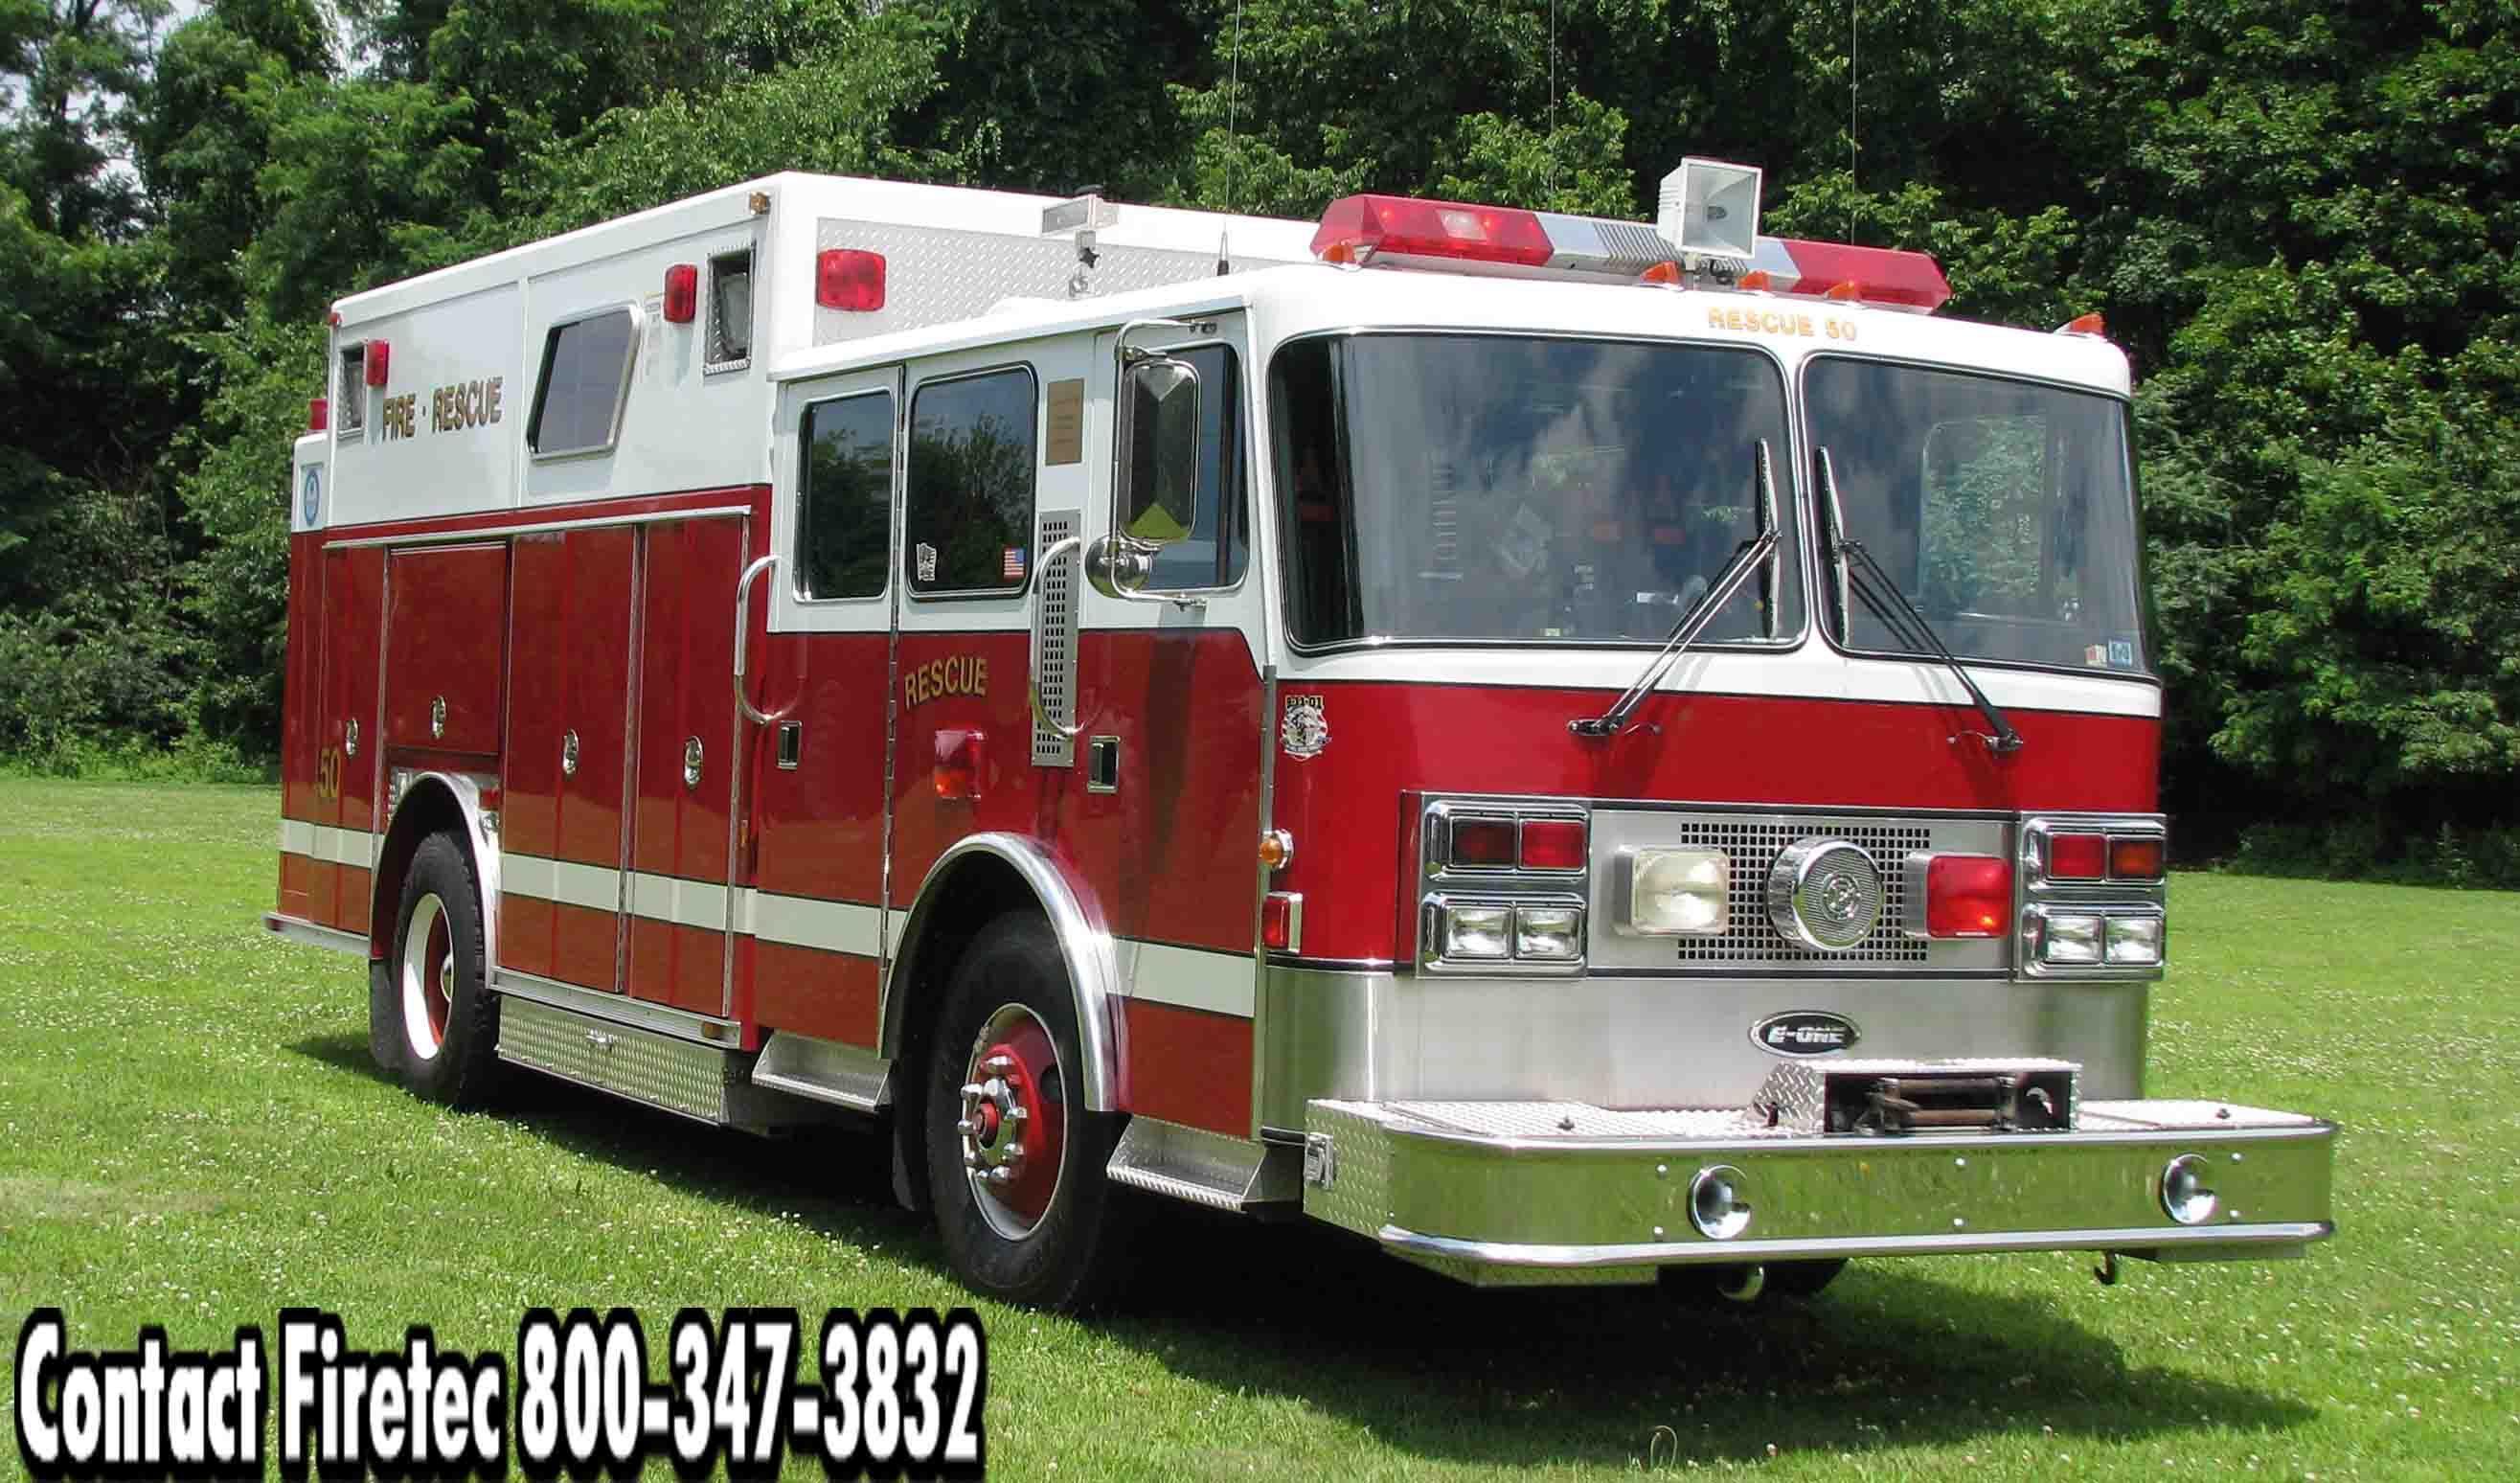 1989 pemfabeone walkaround heavy rescue for sale text